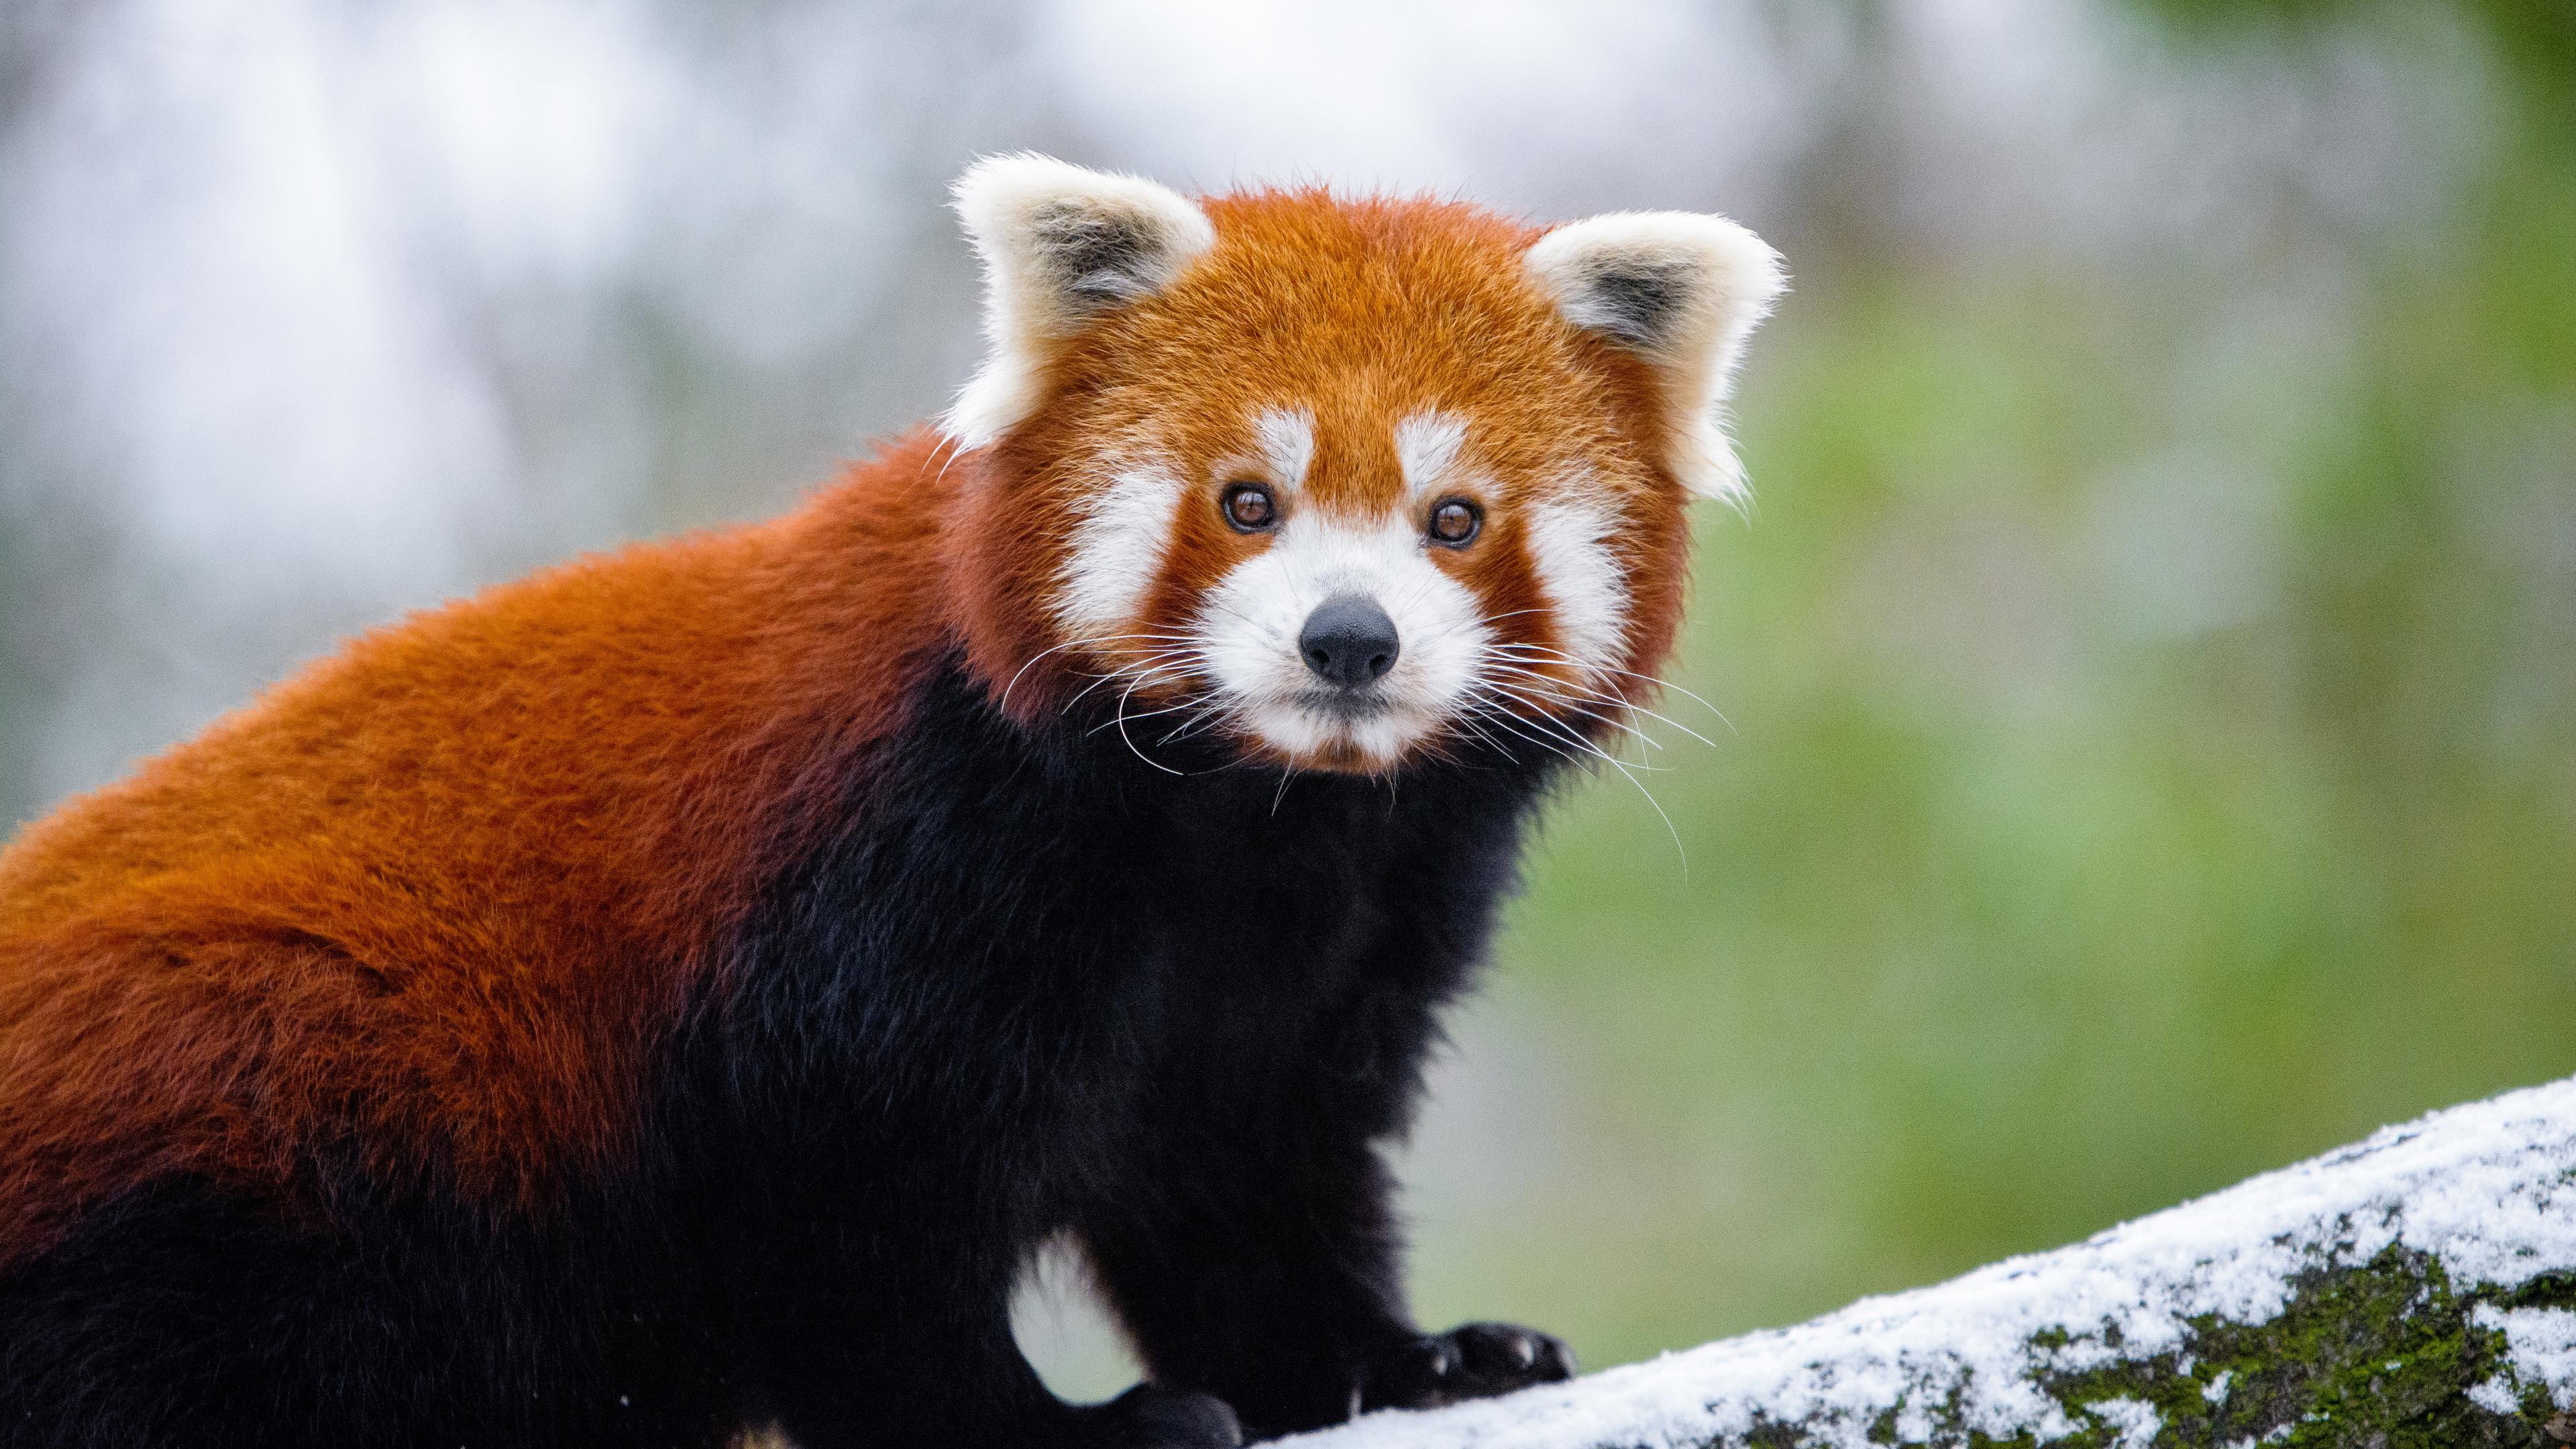 red panda 5k 1546279460 - Red Panda 5k - winter wallpapers, tree wallpapers, snow wallpapers, red panda wallpapers, photography wallpapers, panda wallpapers, hd-wallpapers, cute wallpapers, branch wallpapers, animals wallpapers, 5k wallpapers, 4k-wallpapers